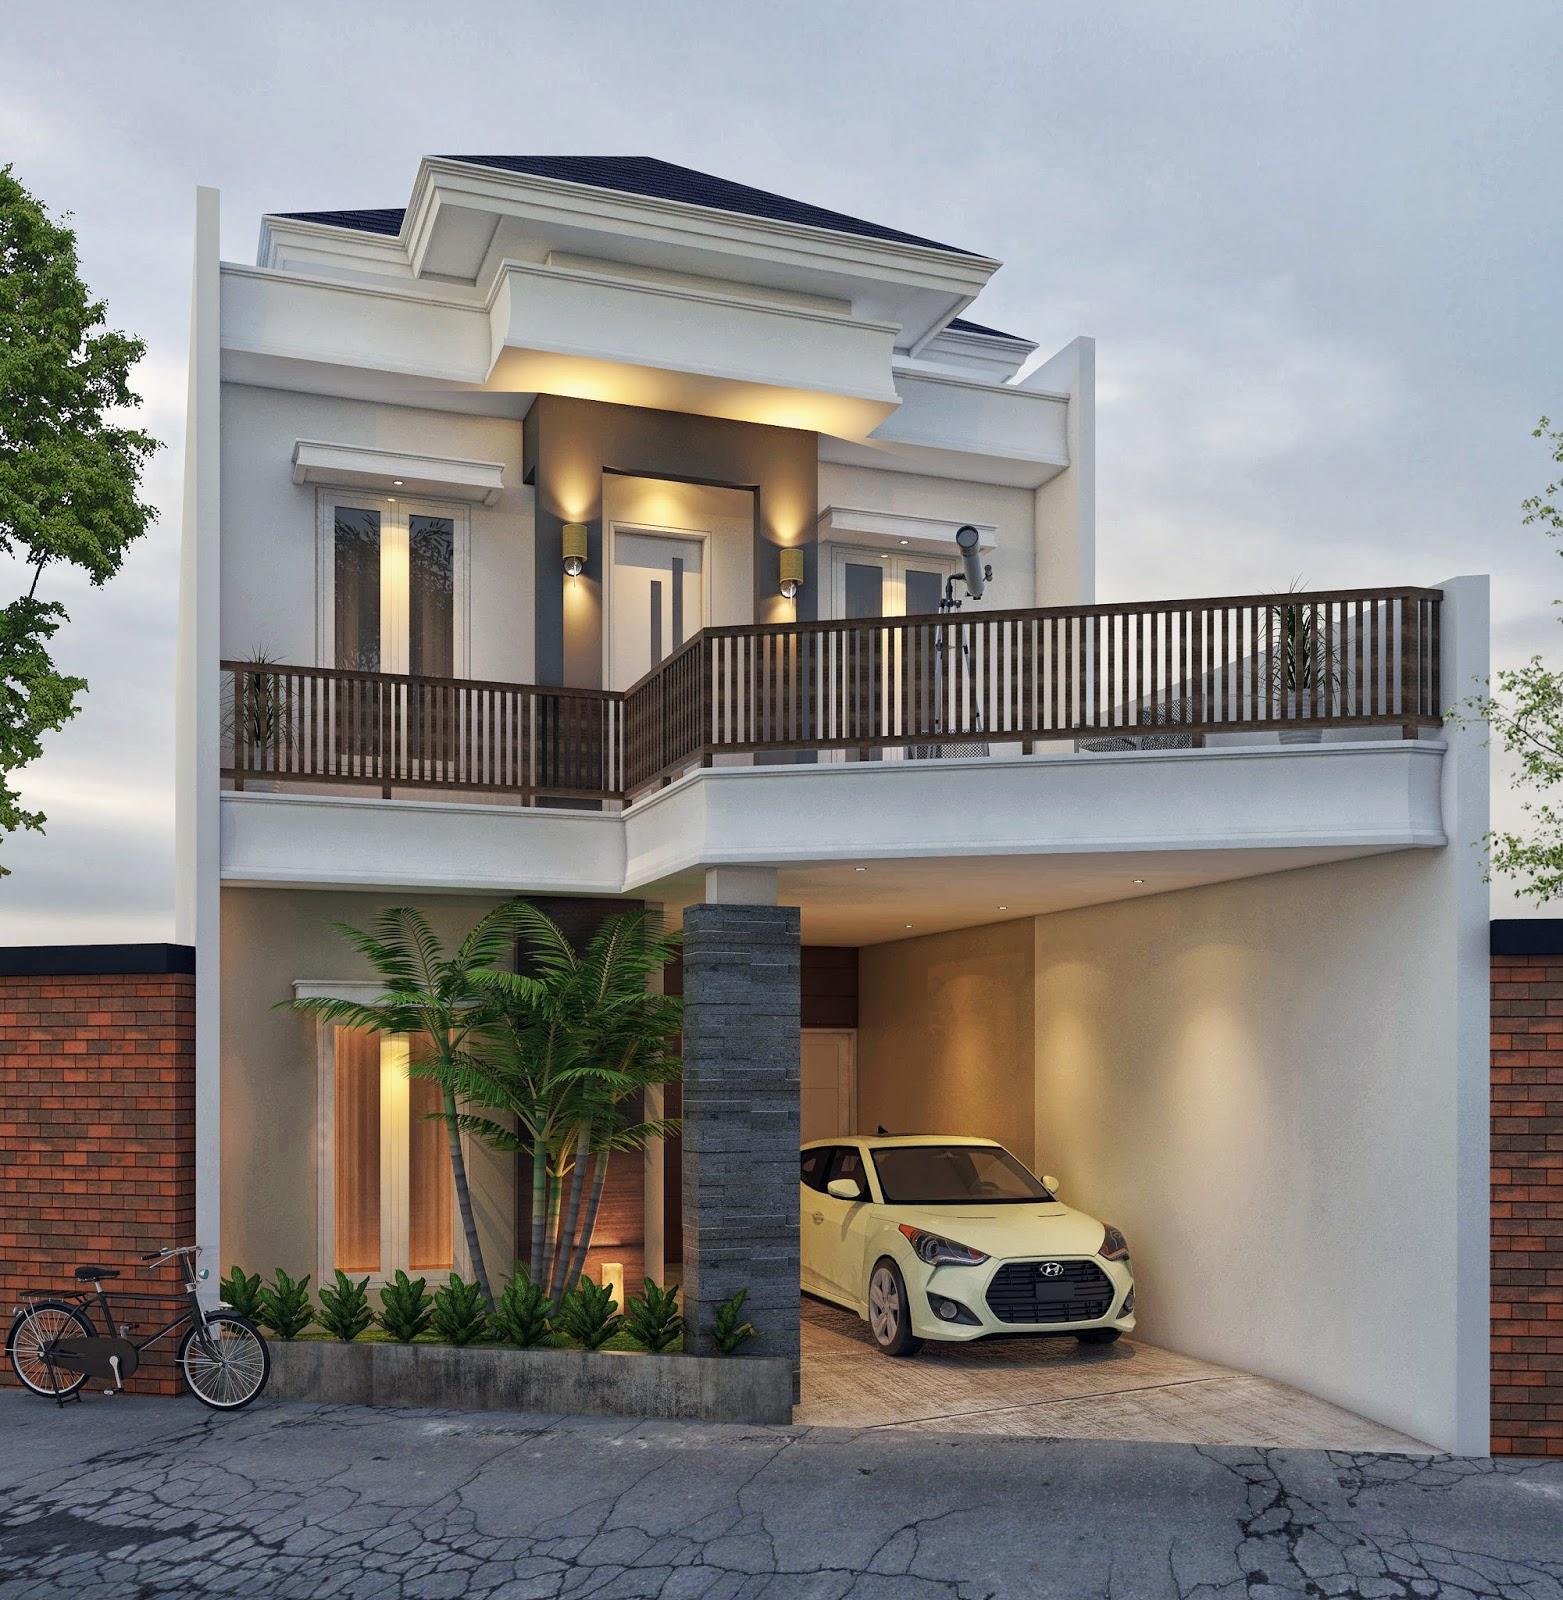 Harga Jasa Desain Interior Cafe: Desain Rumah 2 Lantai , Lebar 7 M , Type 200 Milik Pak